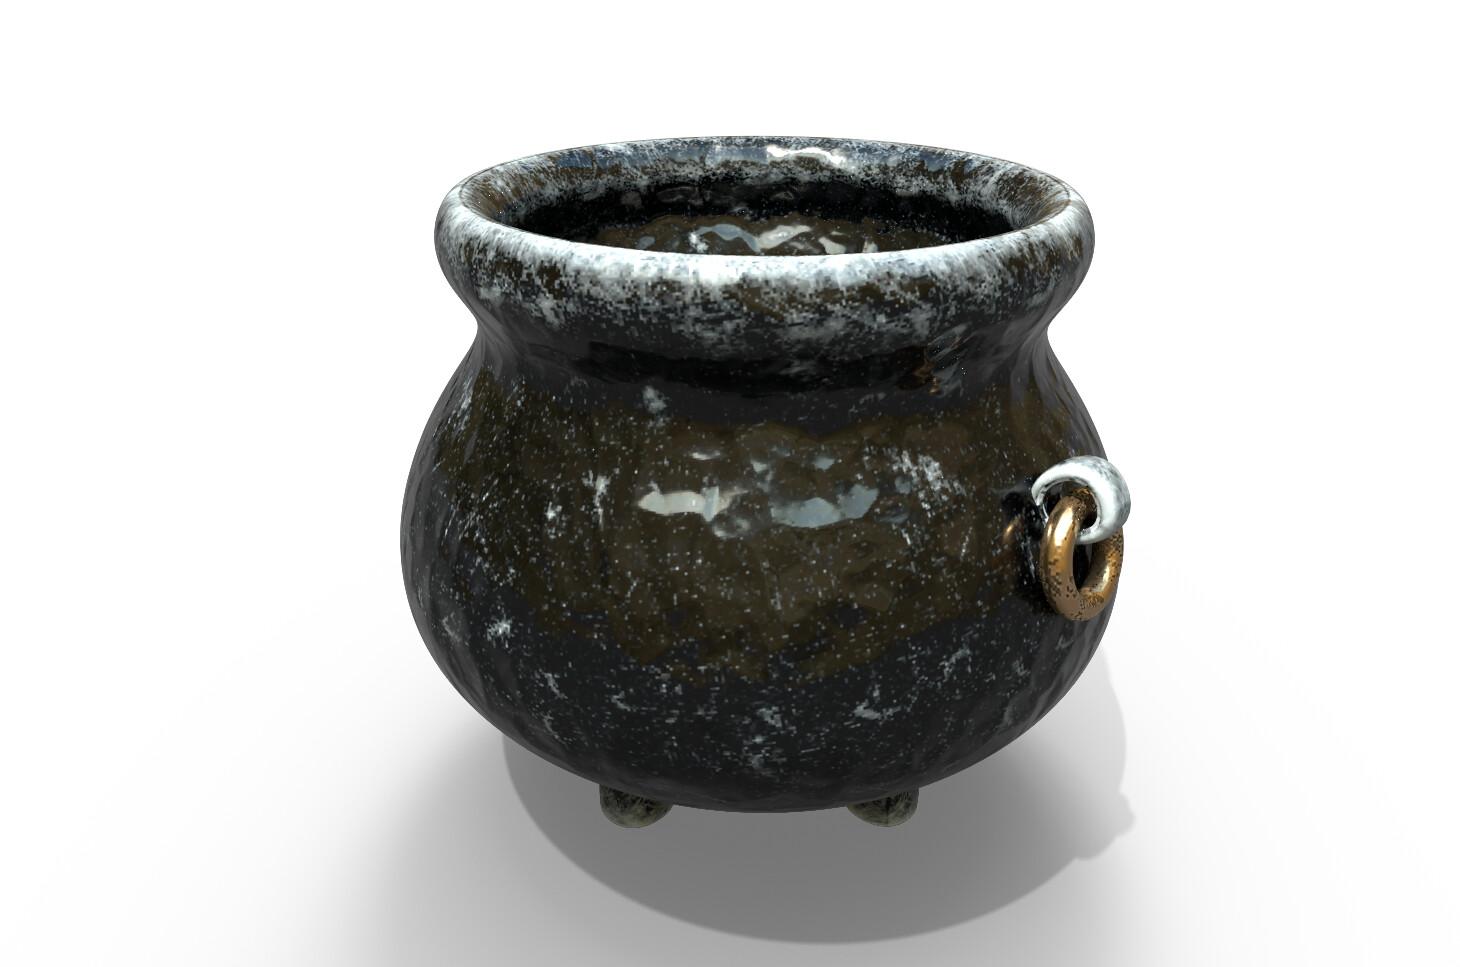 Joseph moniz cauldron001f